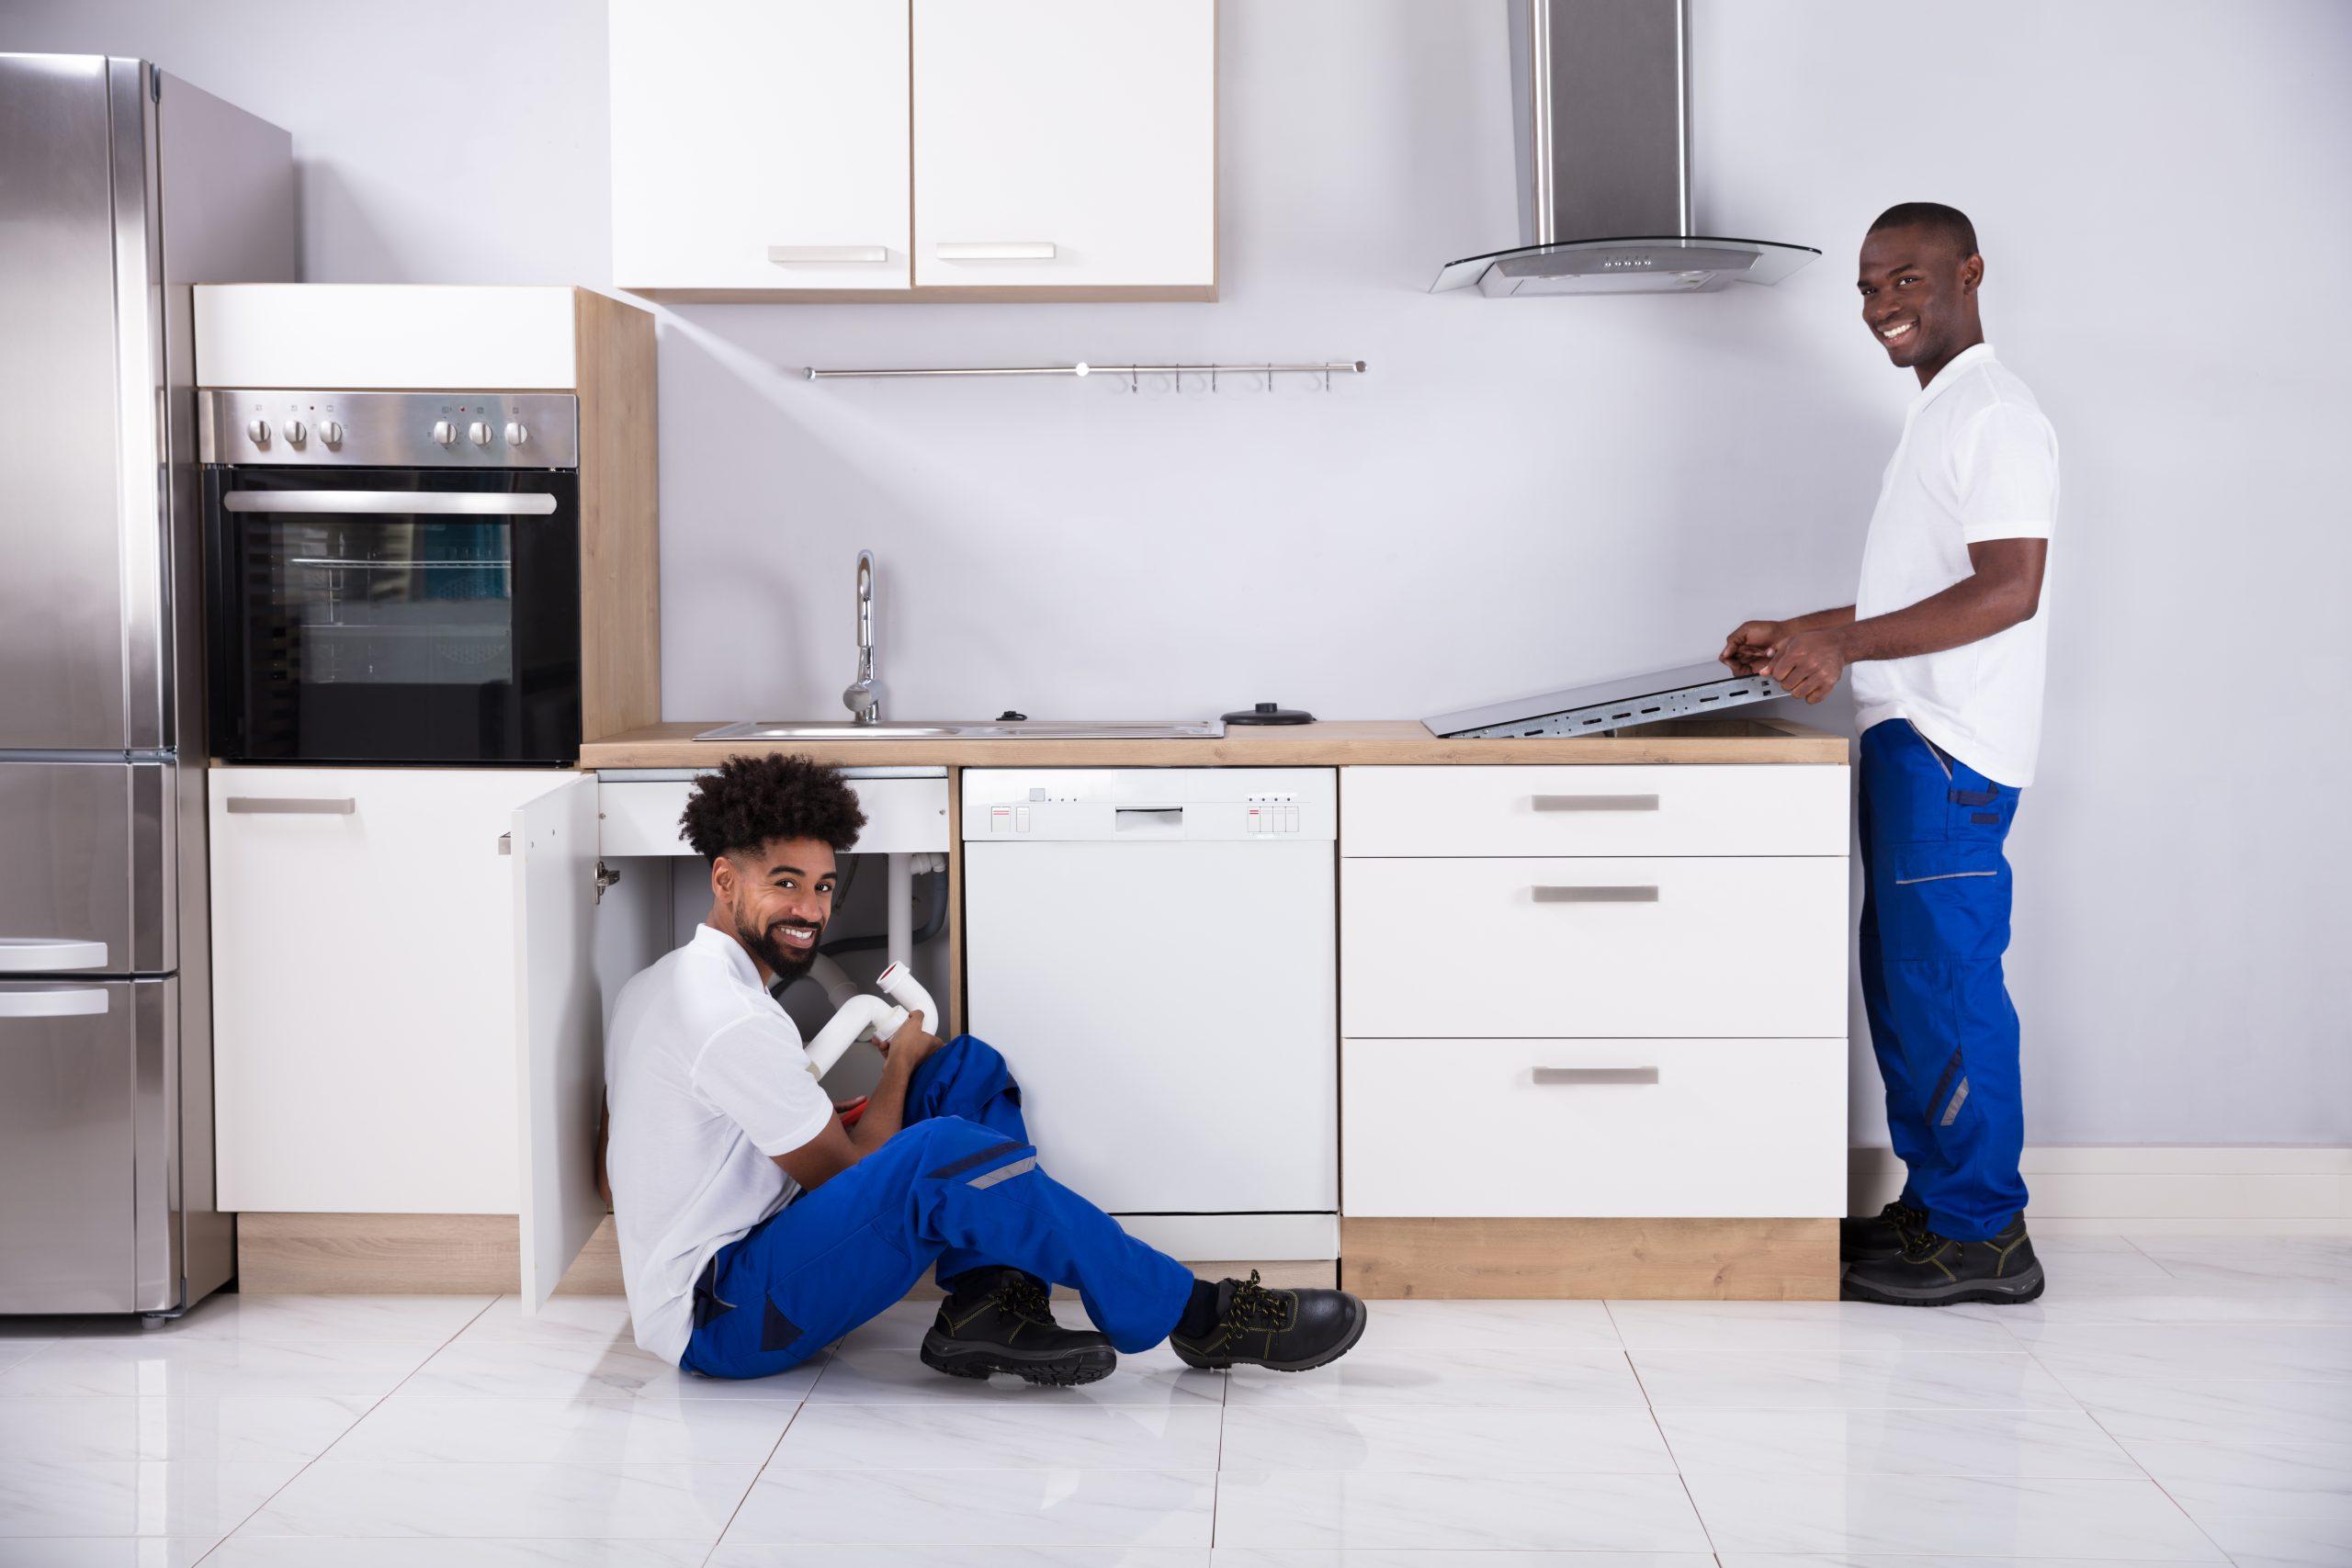 Men-Assembling-Kitchen-Services